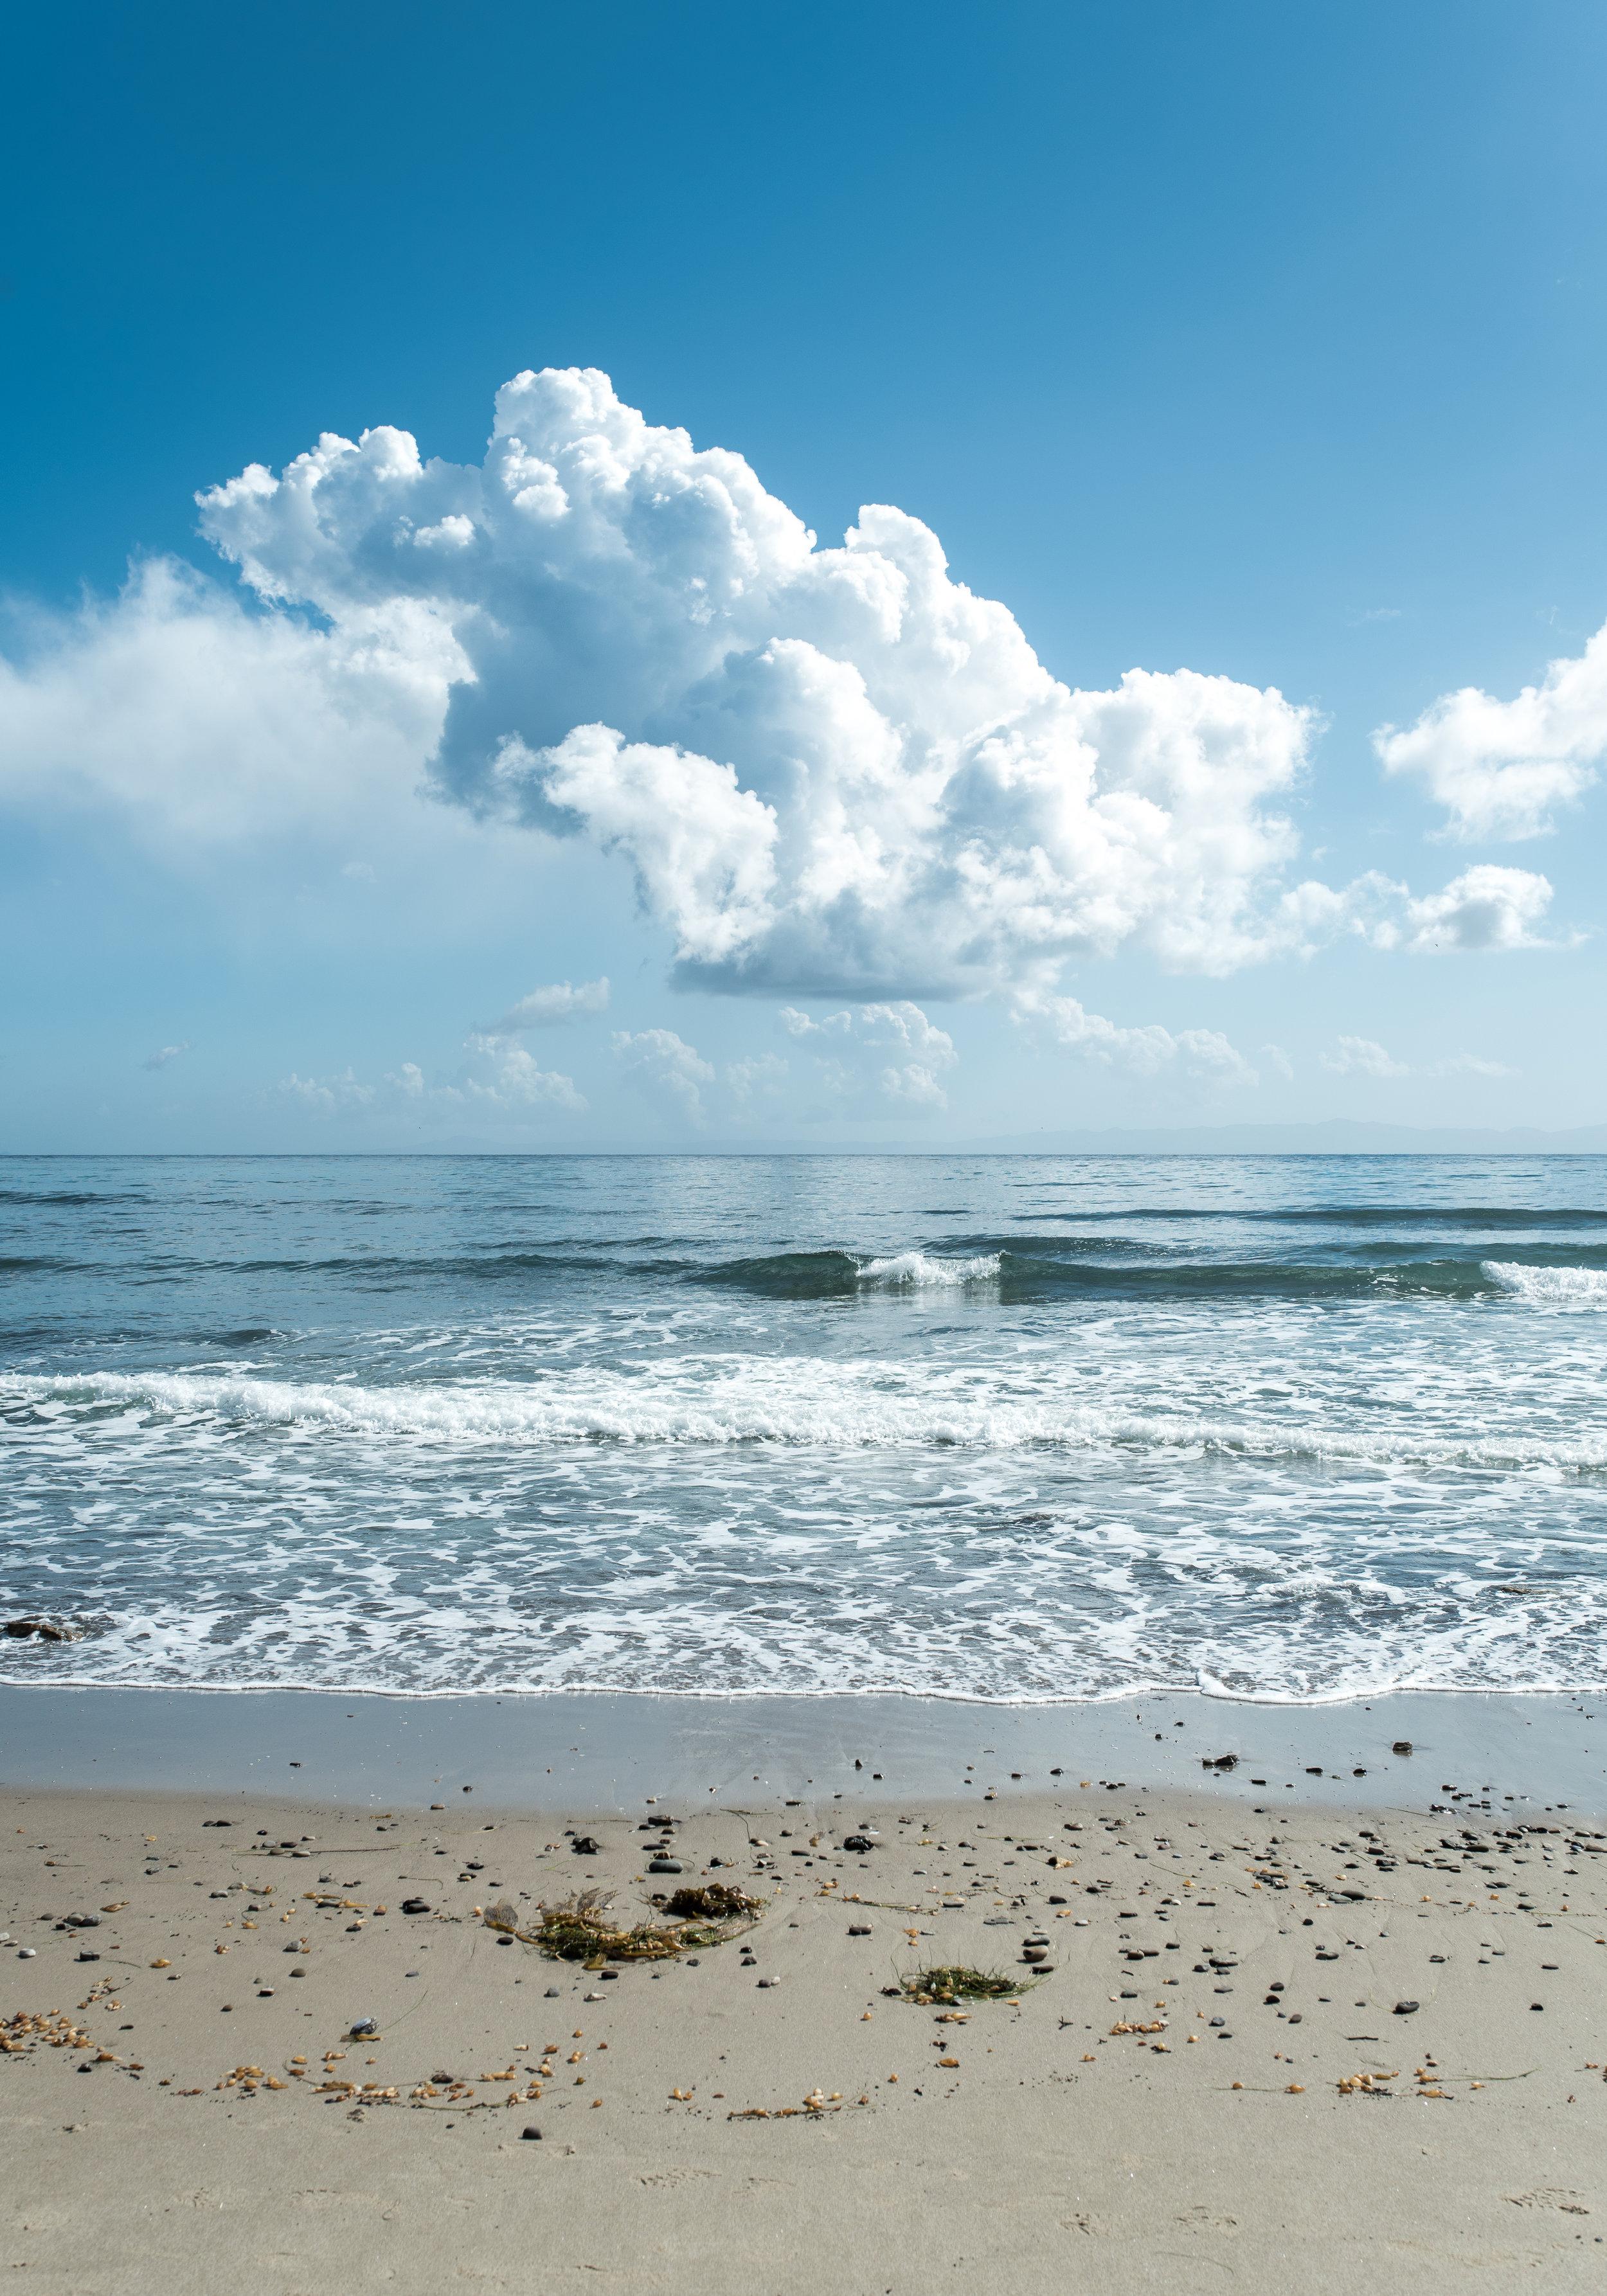 SantaBarbara_Beach_Cloud_renrob©.jpg